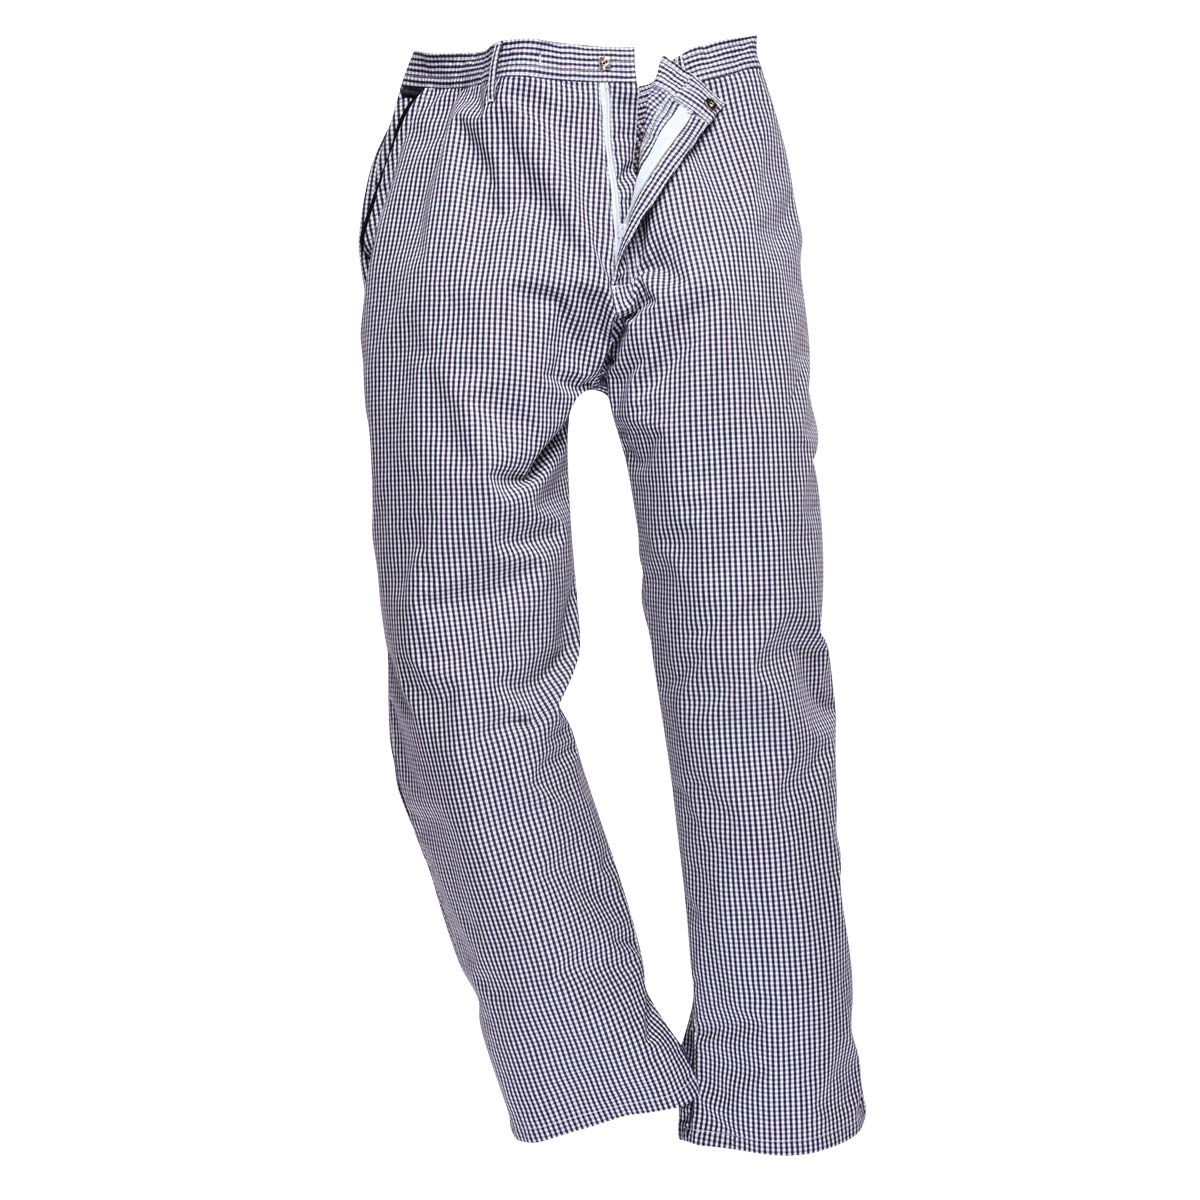 Barnet Chefs Trousers - C075